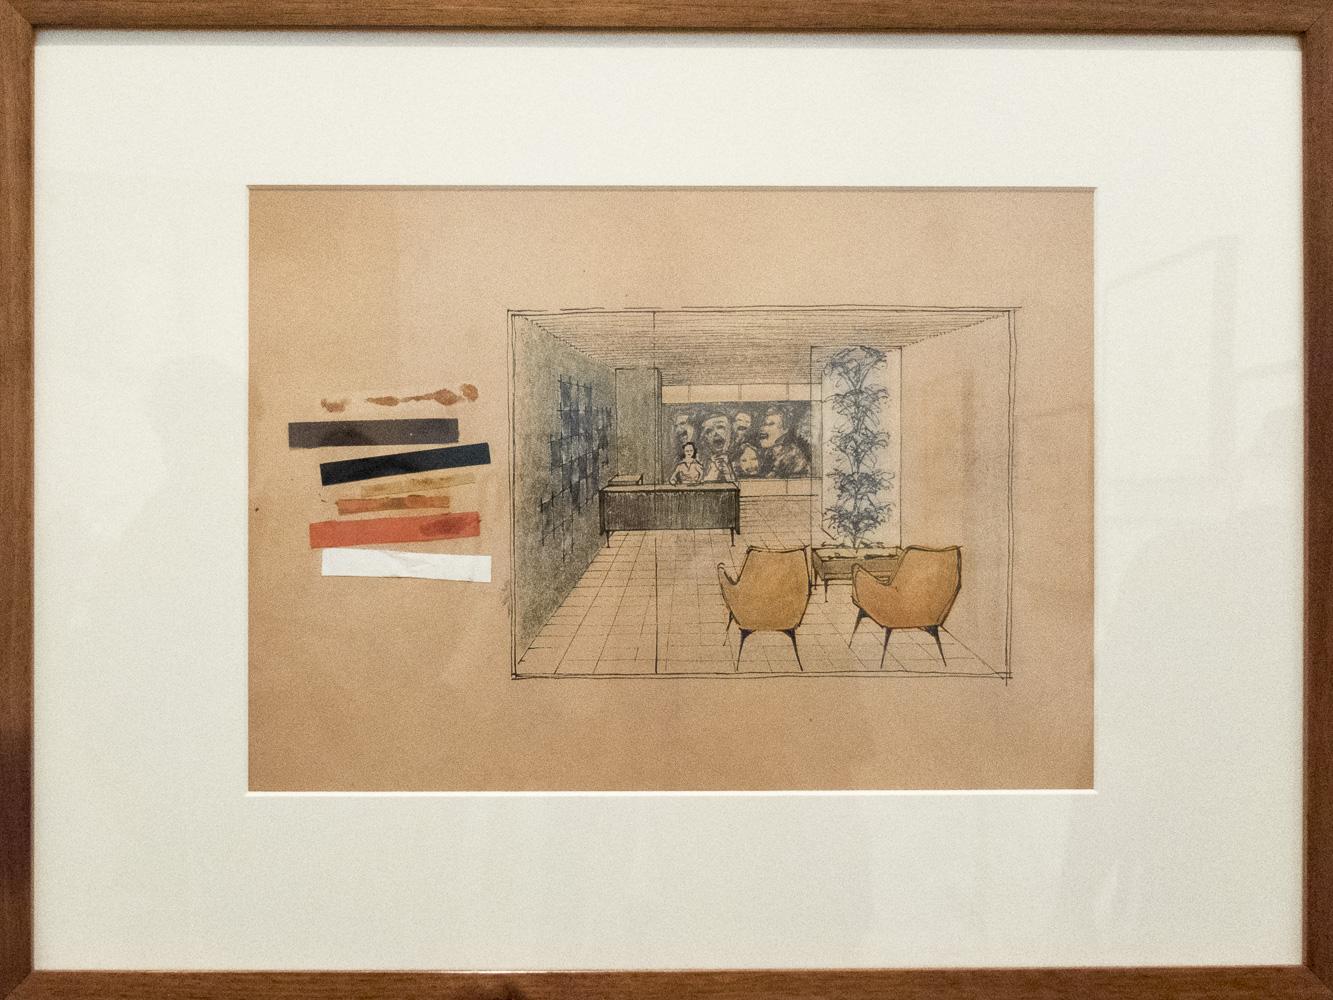 Heide Featherston Exhibition Cantilever Interiors Furniture Design (30).JPG